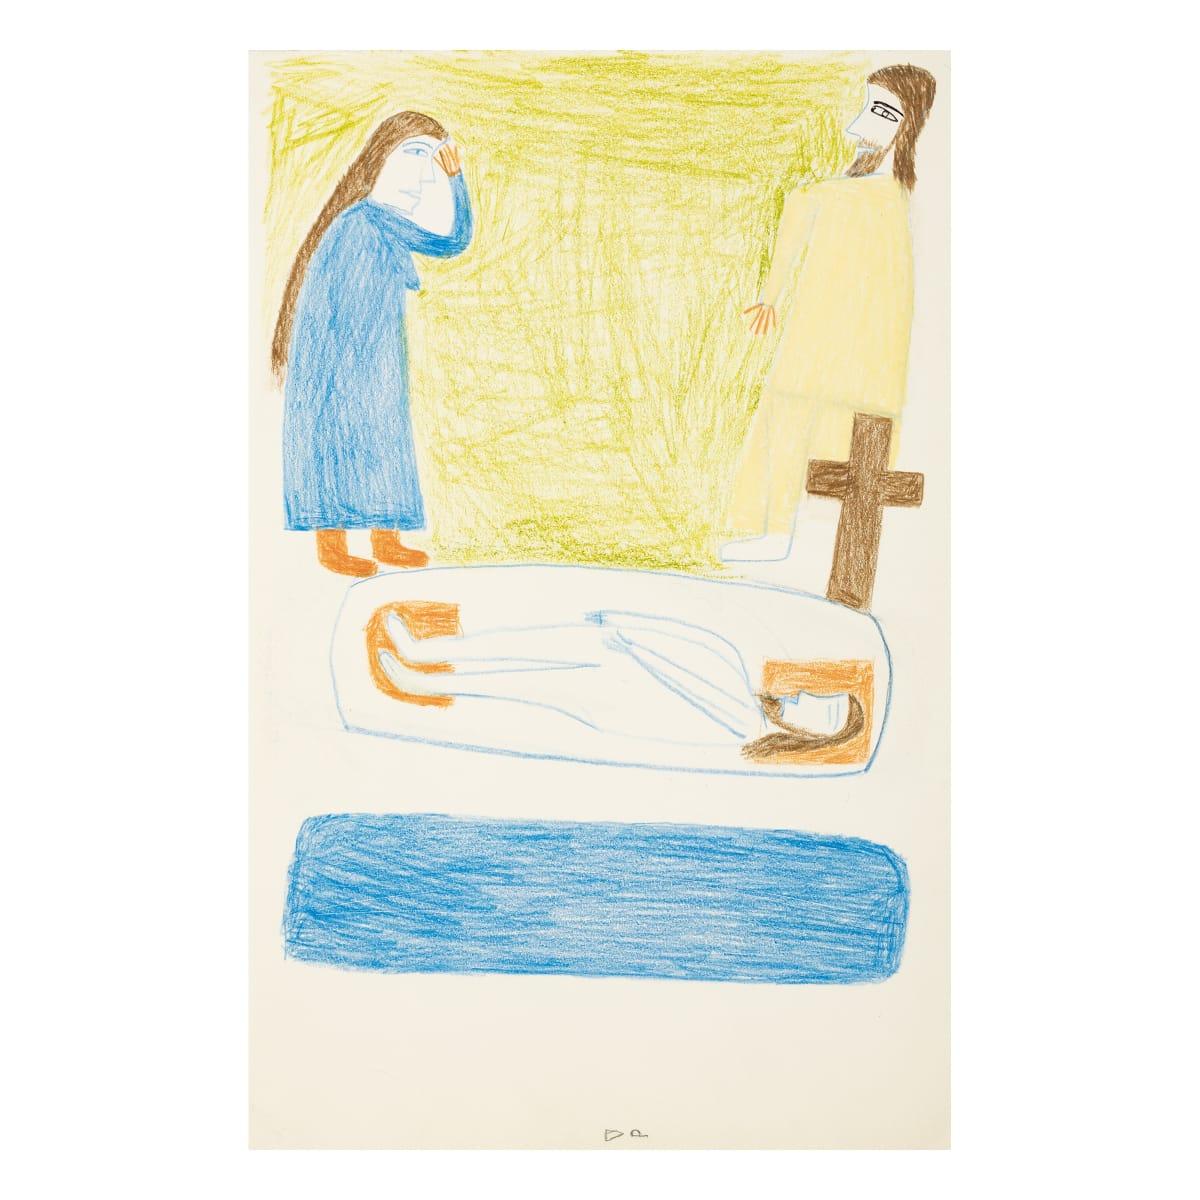 JESSIE OONARK, O.C., R.C.A (1906-1985) QAMANI'TUAQ (BAKER LAKE) Untitled (Magdalene at the Tomb of Jesus), c. 1976 REALIZED: $1,560